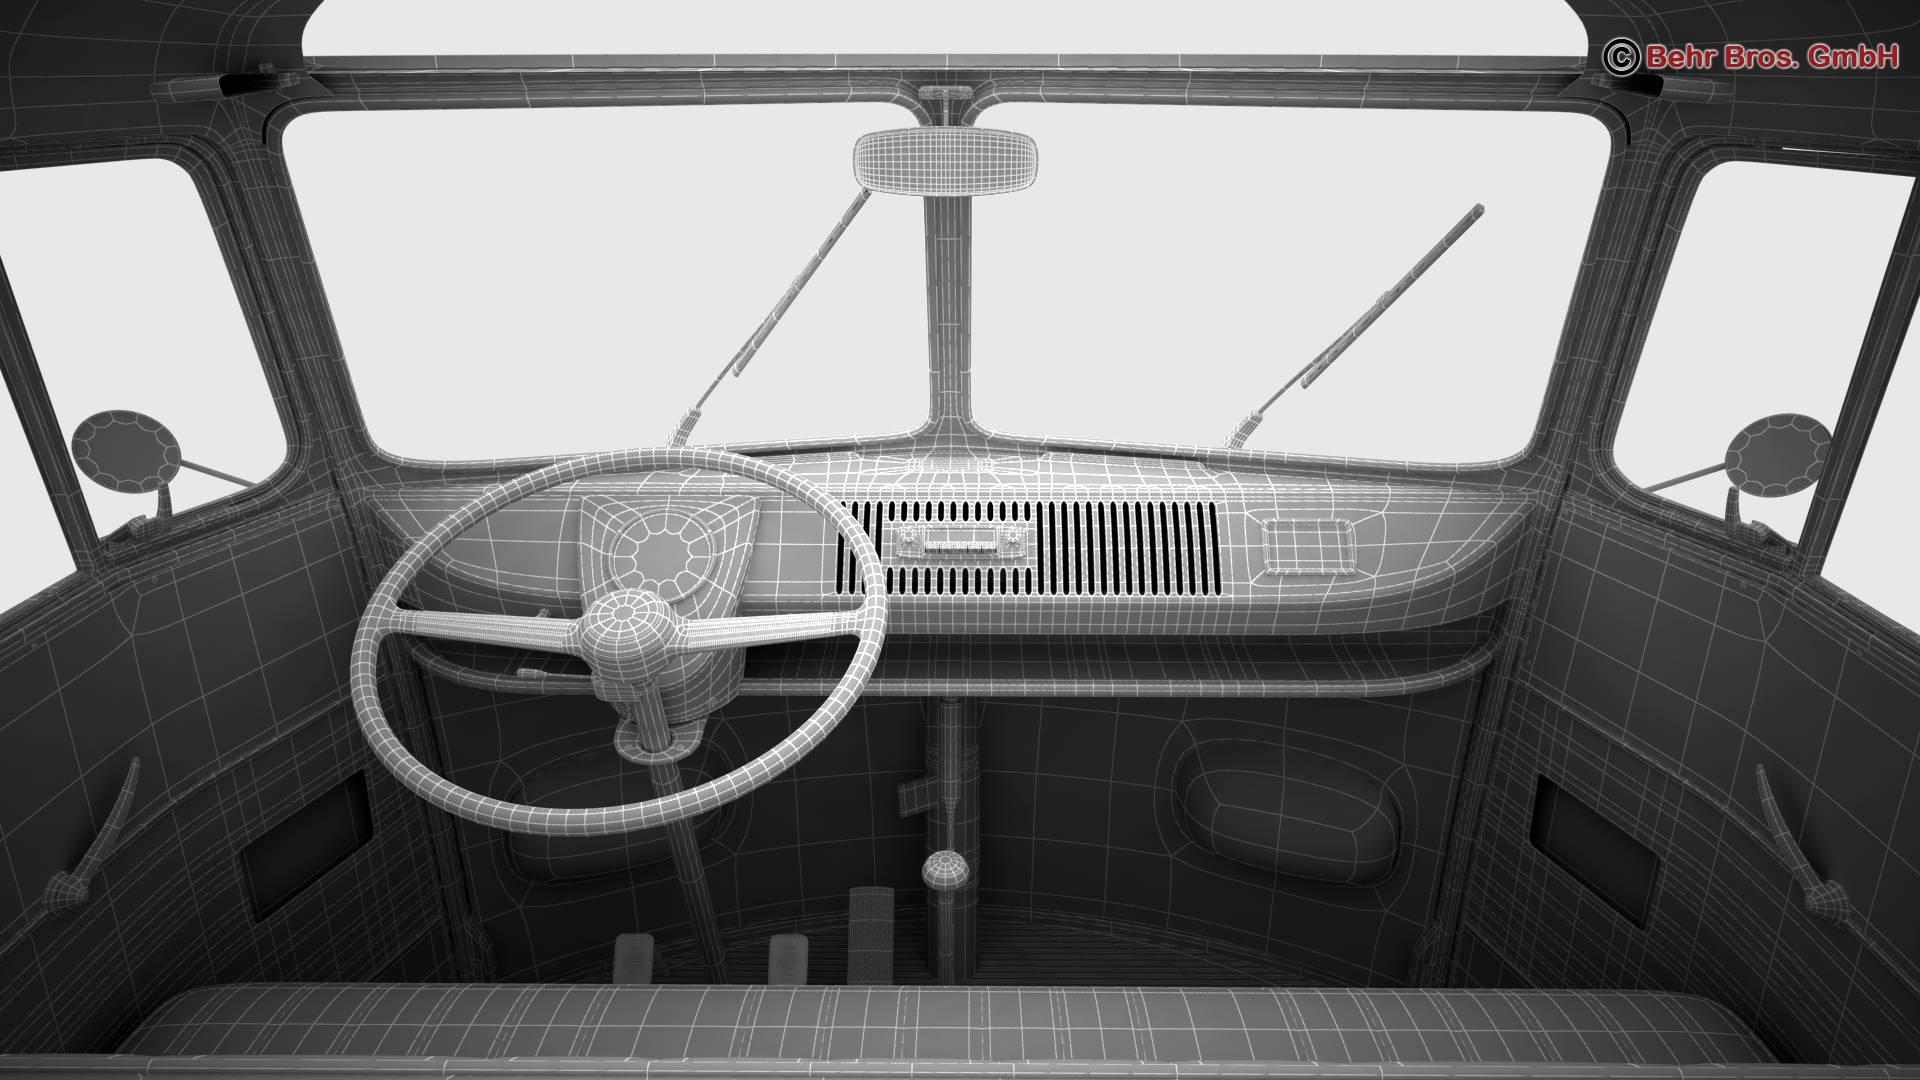 volkswagen type 2 samba 1959 3d model 3ds max fbx c4d lwo ma mb obj 217134